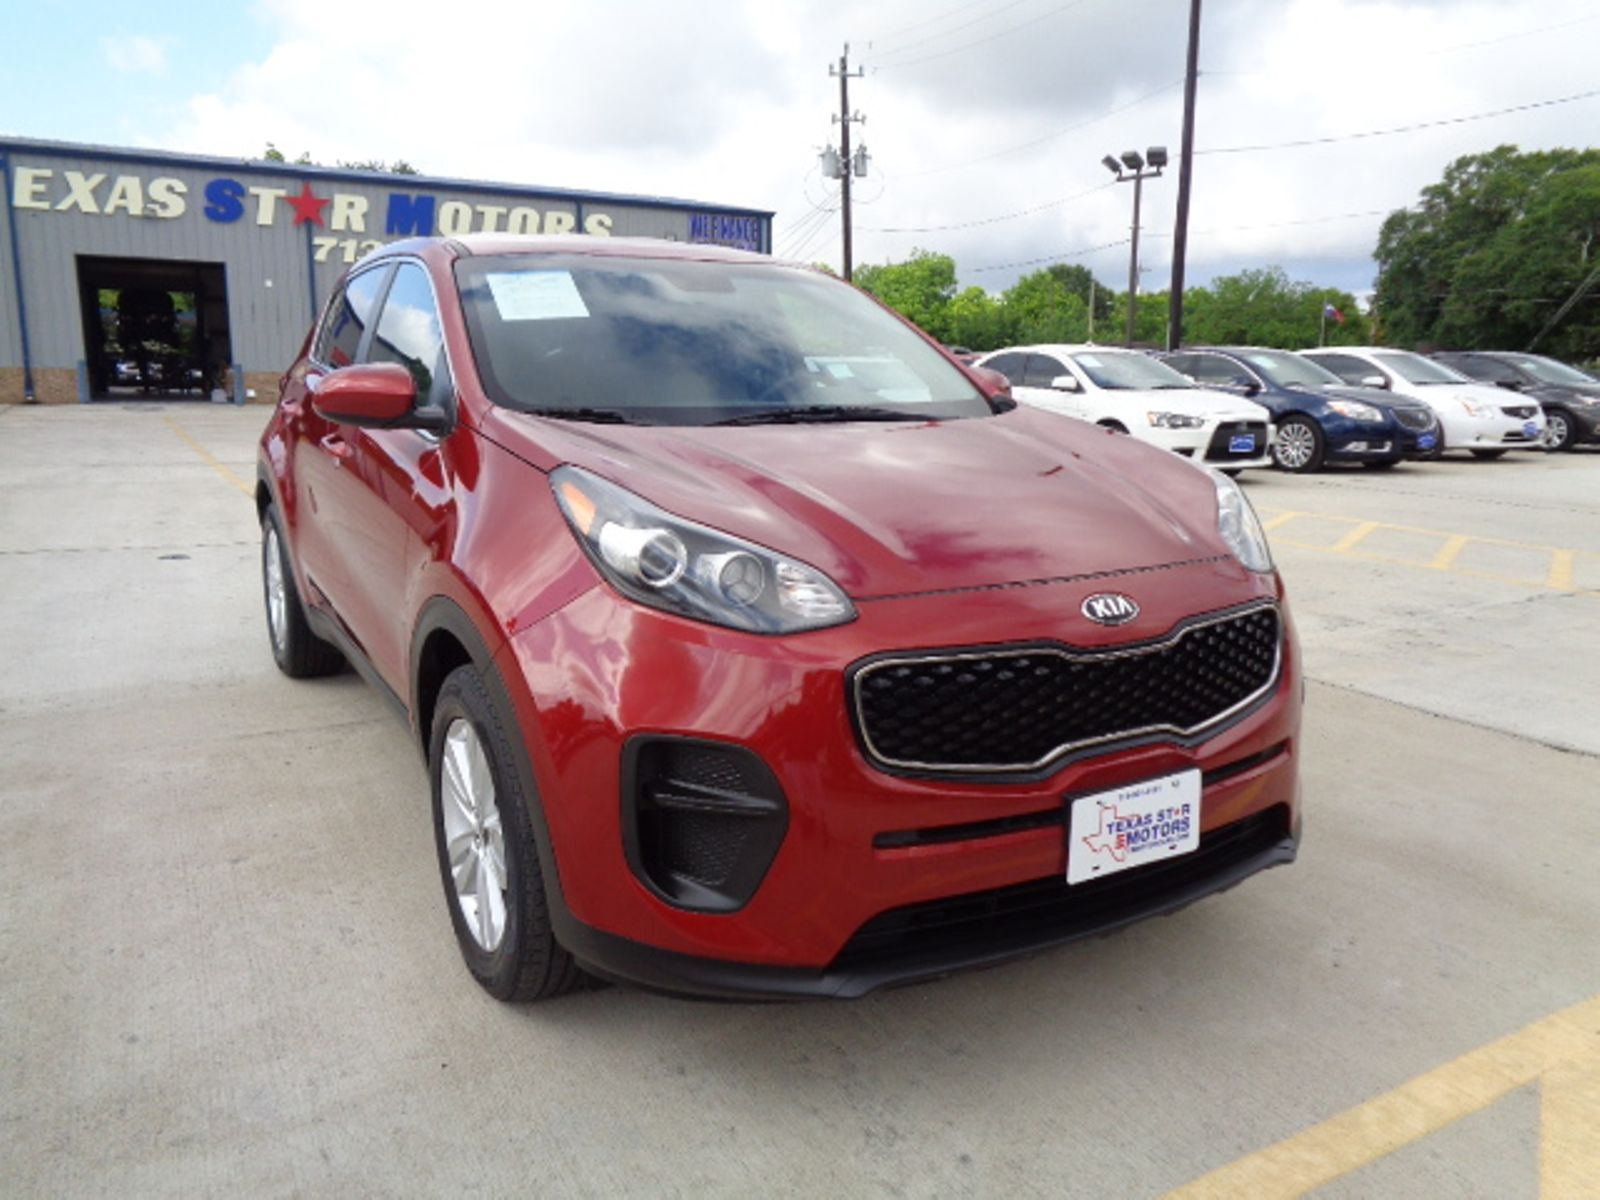 Star Motors Houston >> 2017 Kia Sportage Lx City Tx Texas Star Motors